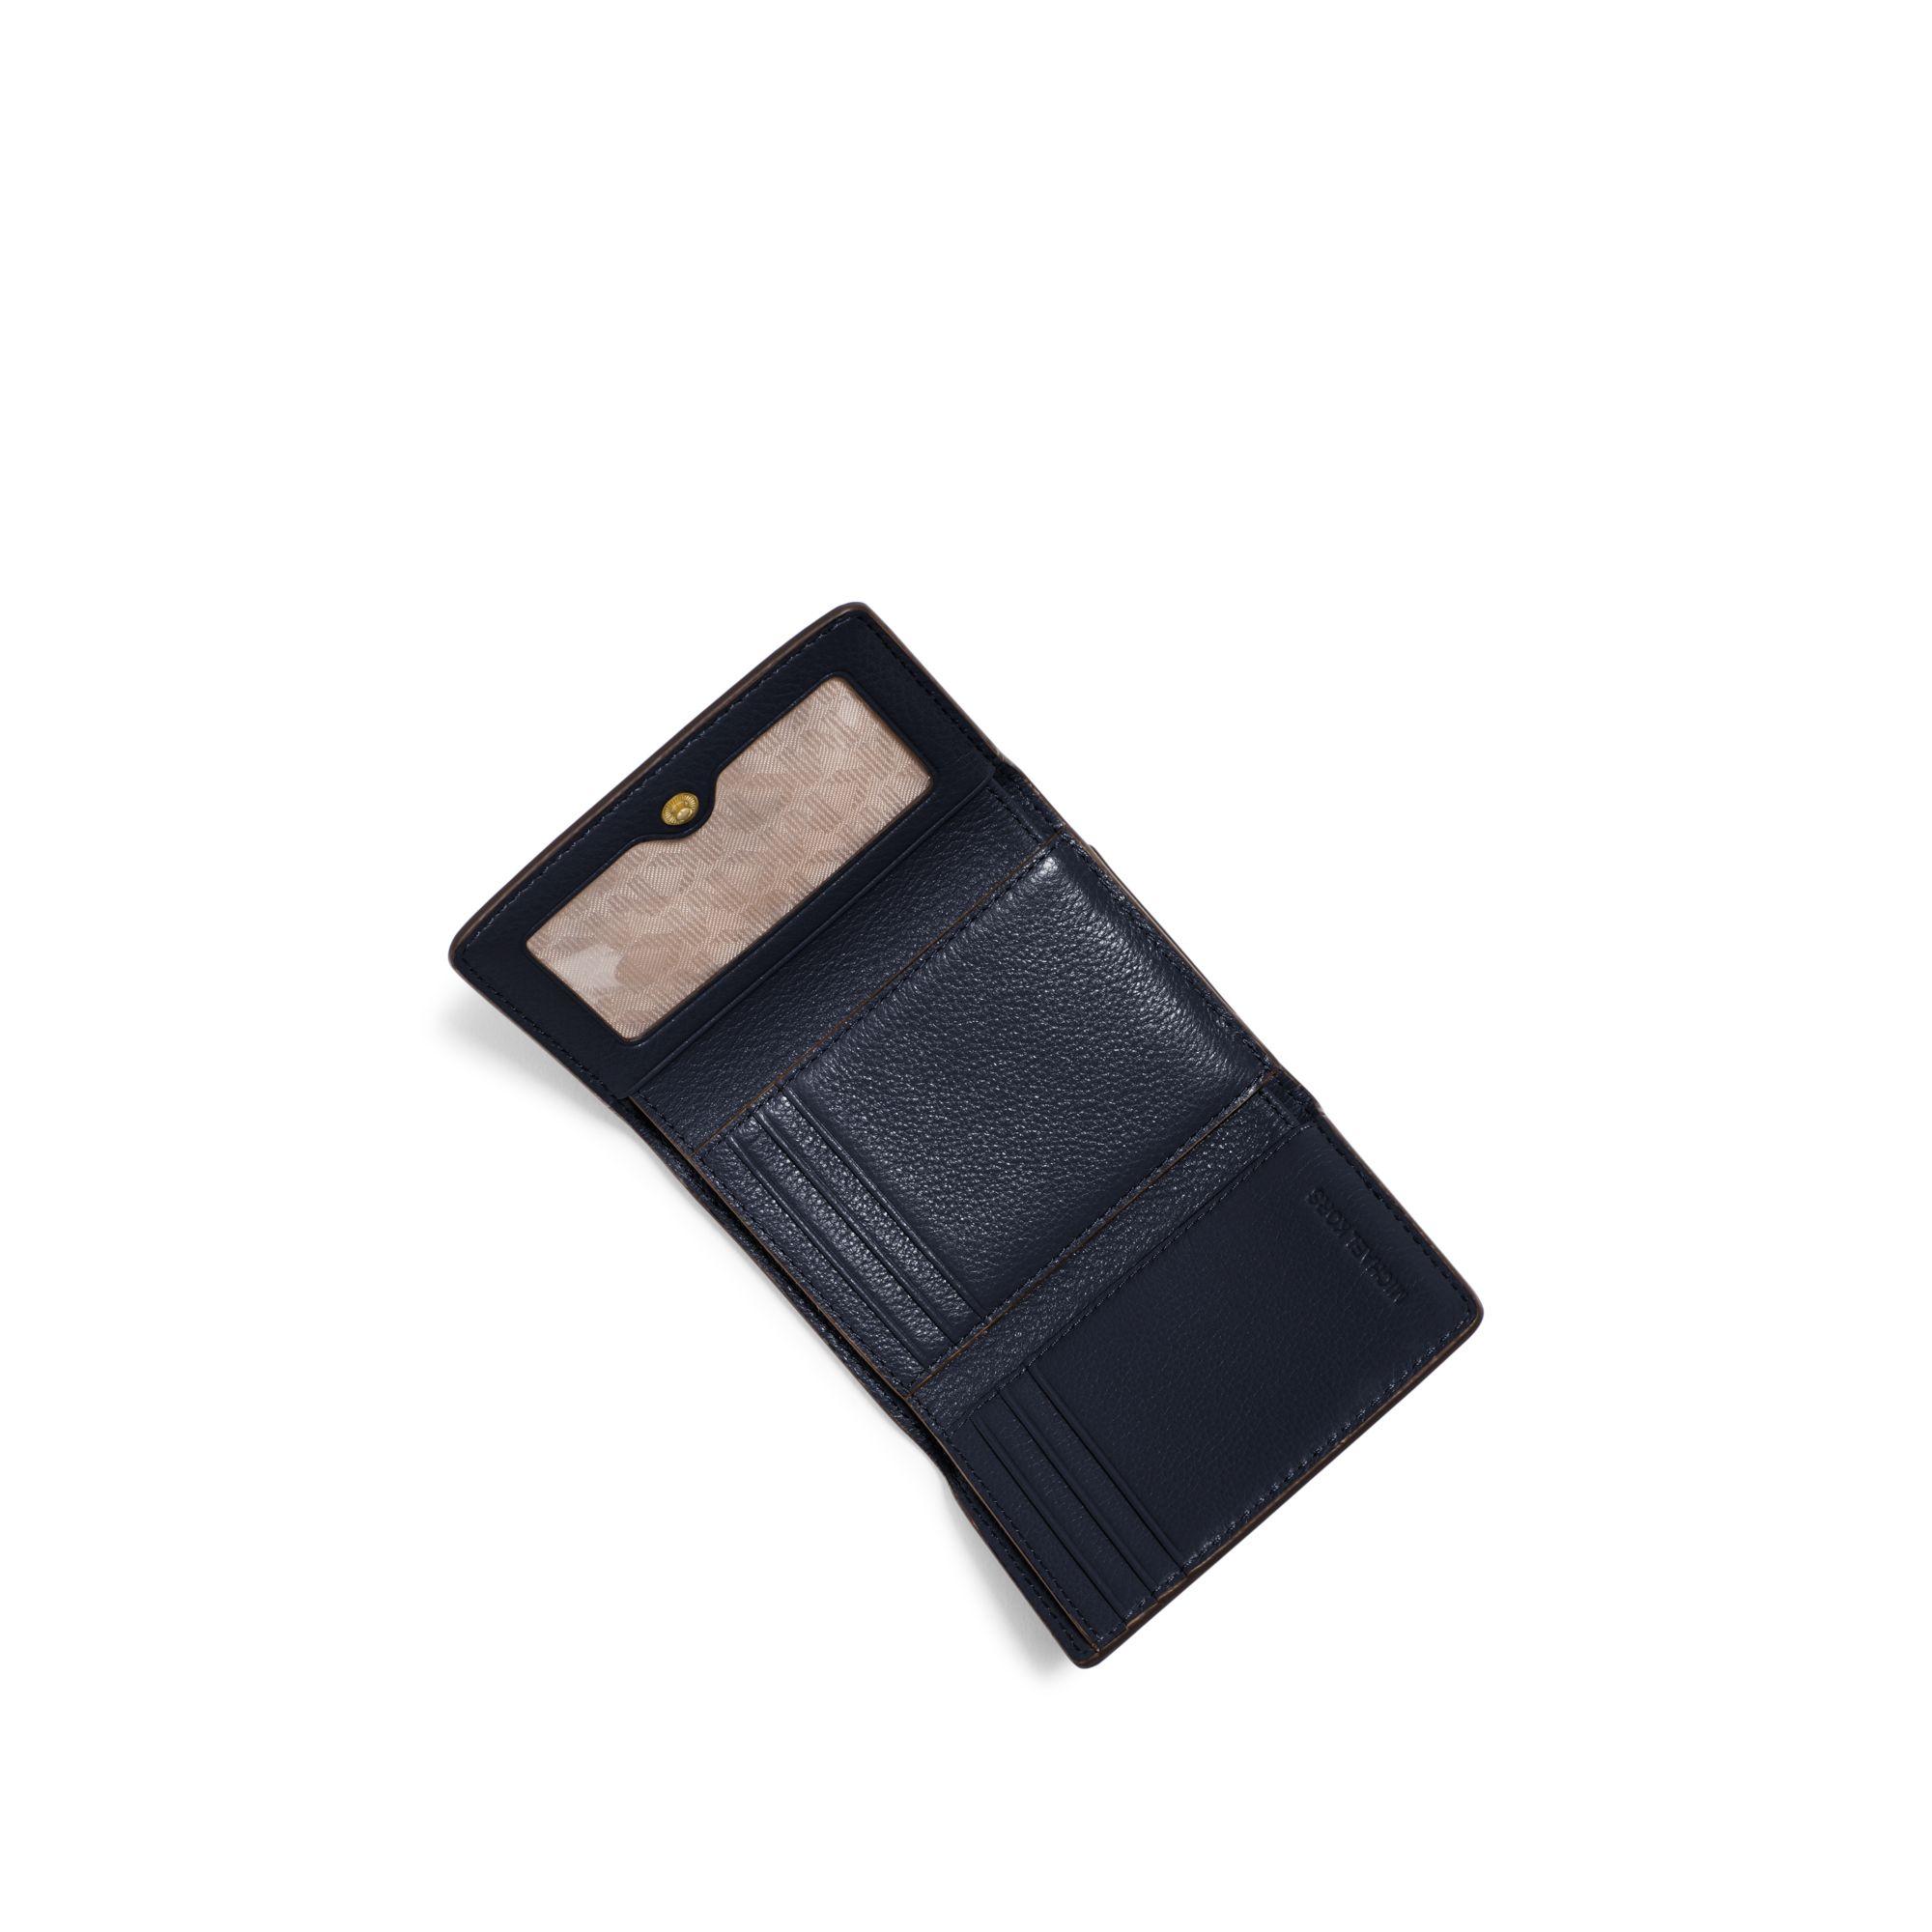 b8262150537b Michael Kors Liane Small Leather Card Holder in Blue - Lyst